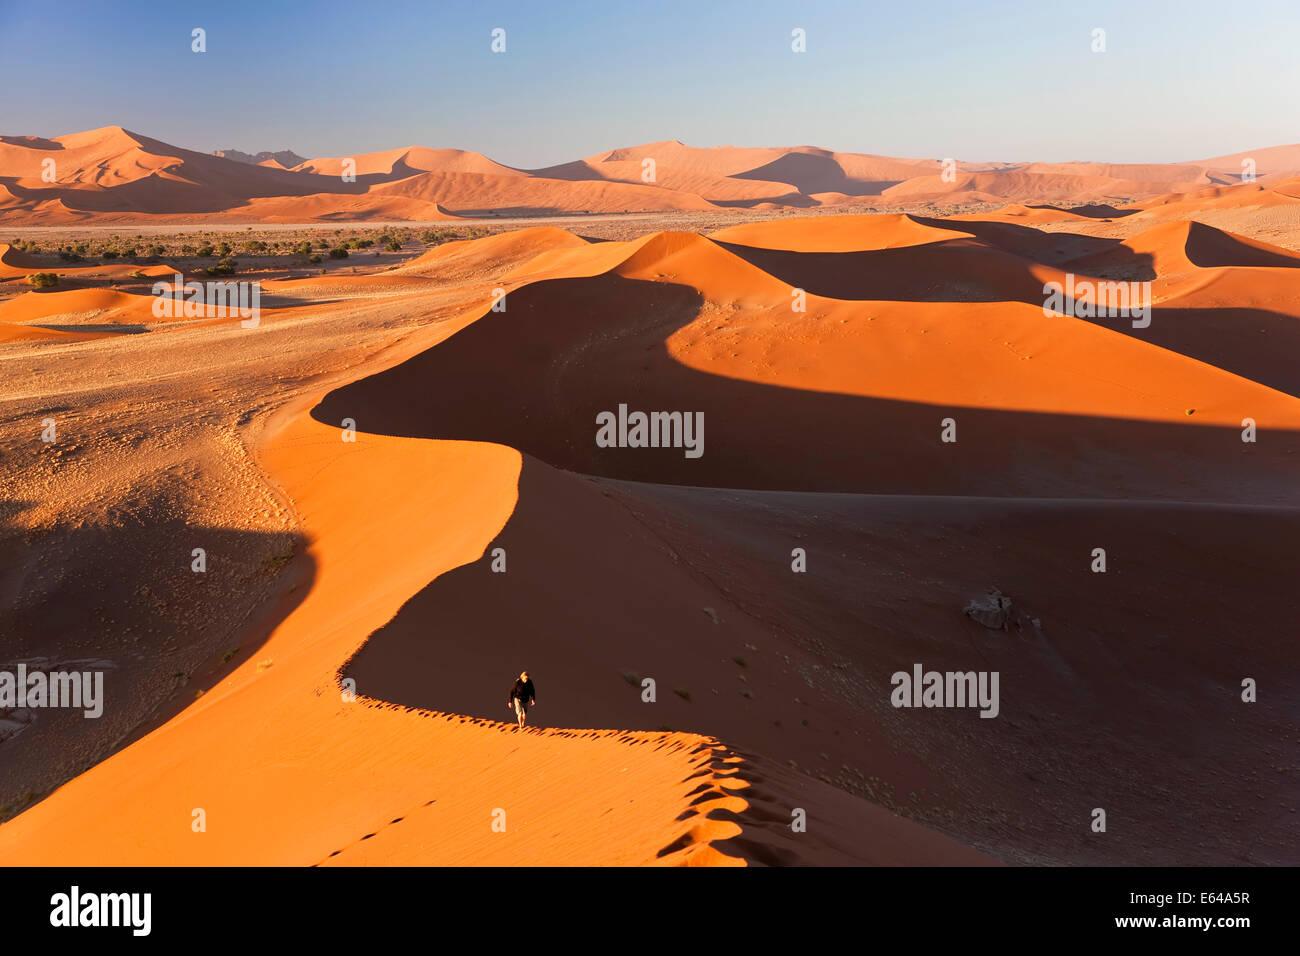 Uomo di arrampicata dune di sabbia, Namib Naukluft National Park, Namibia Immagini Stock